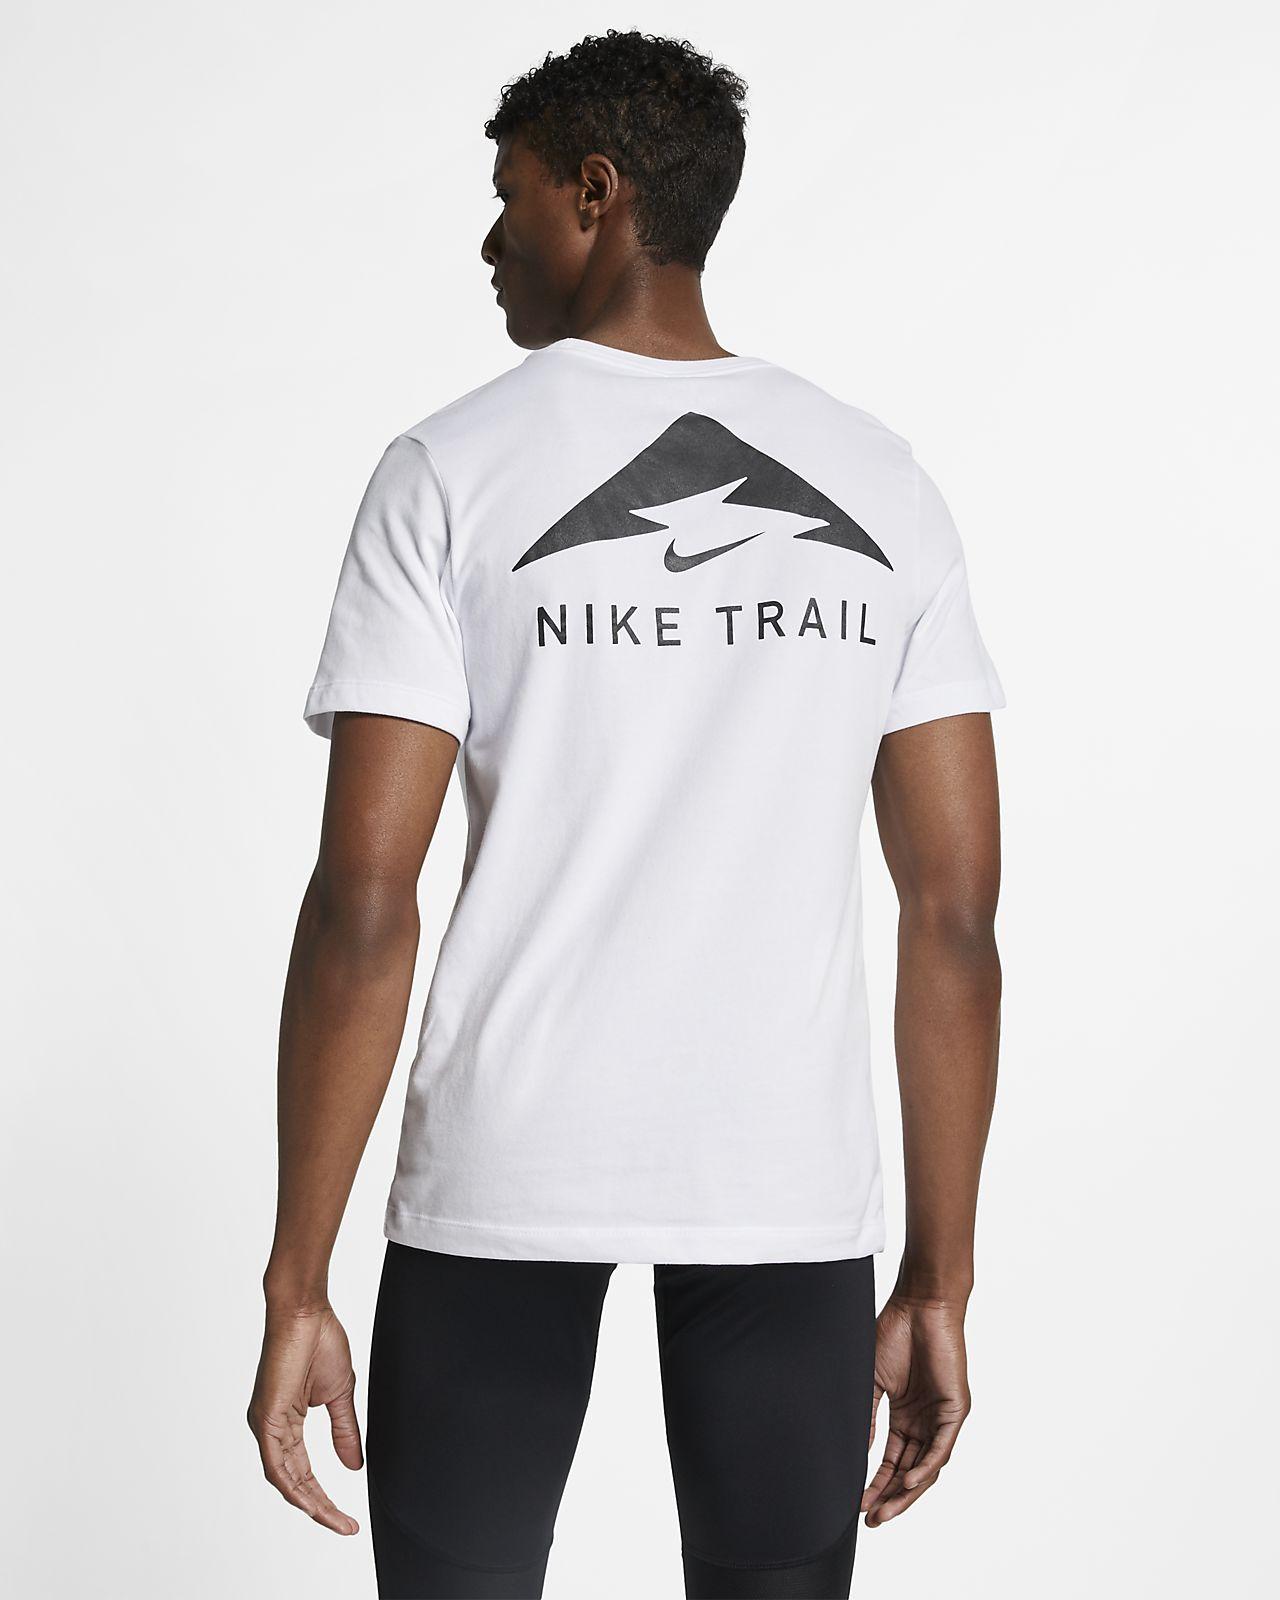 Nike Trail Dri FIT løbe T shirt til mænd